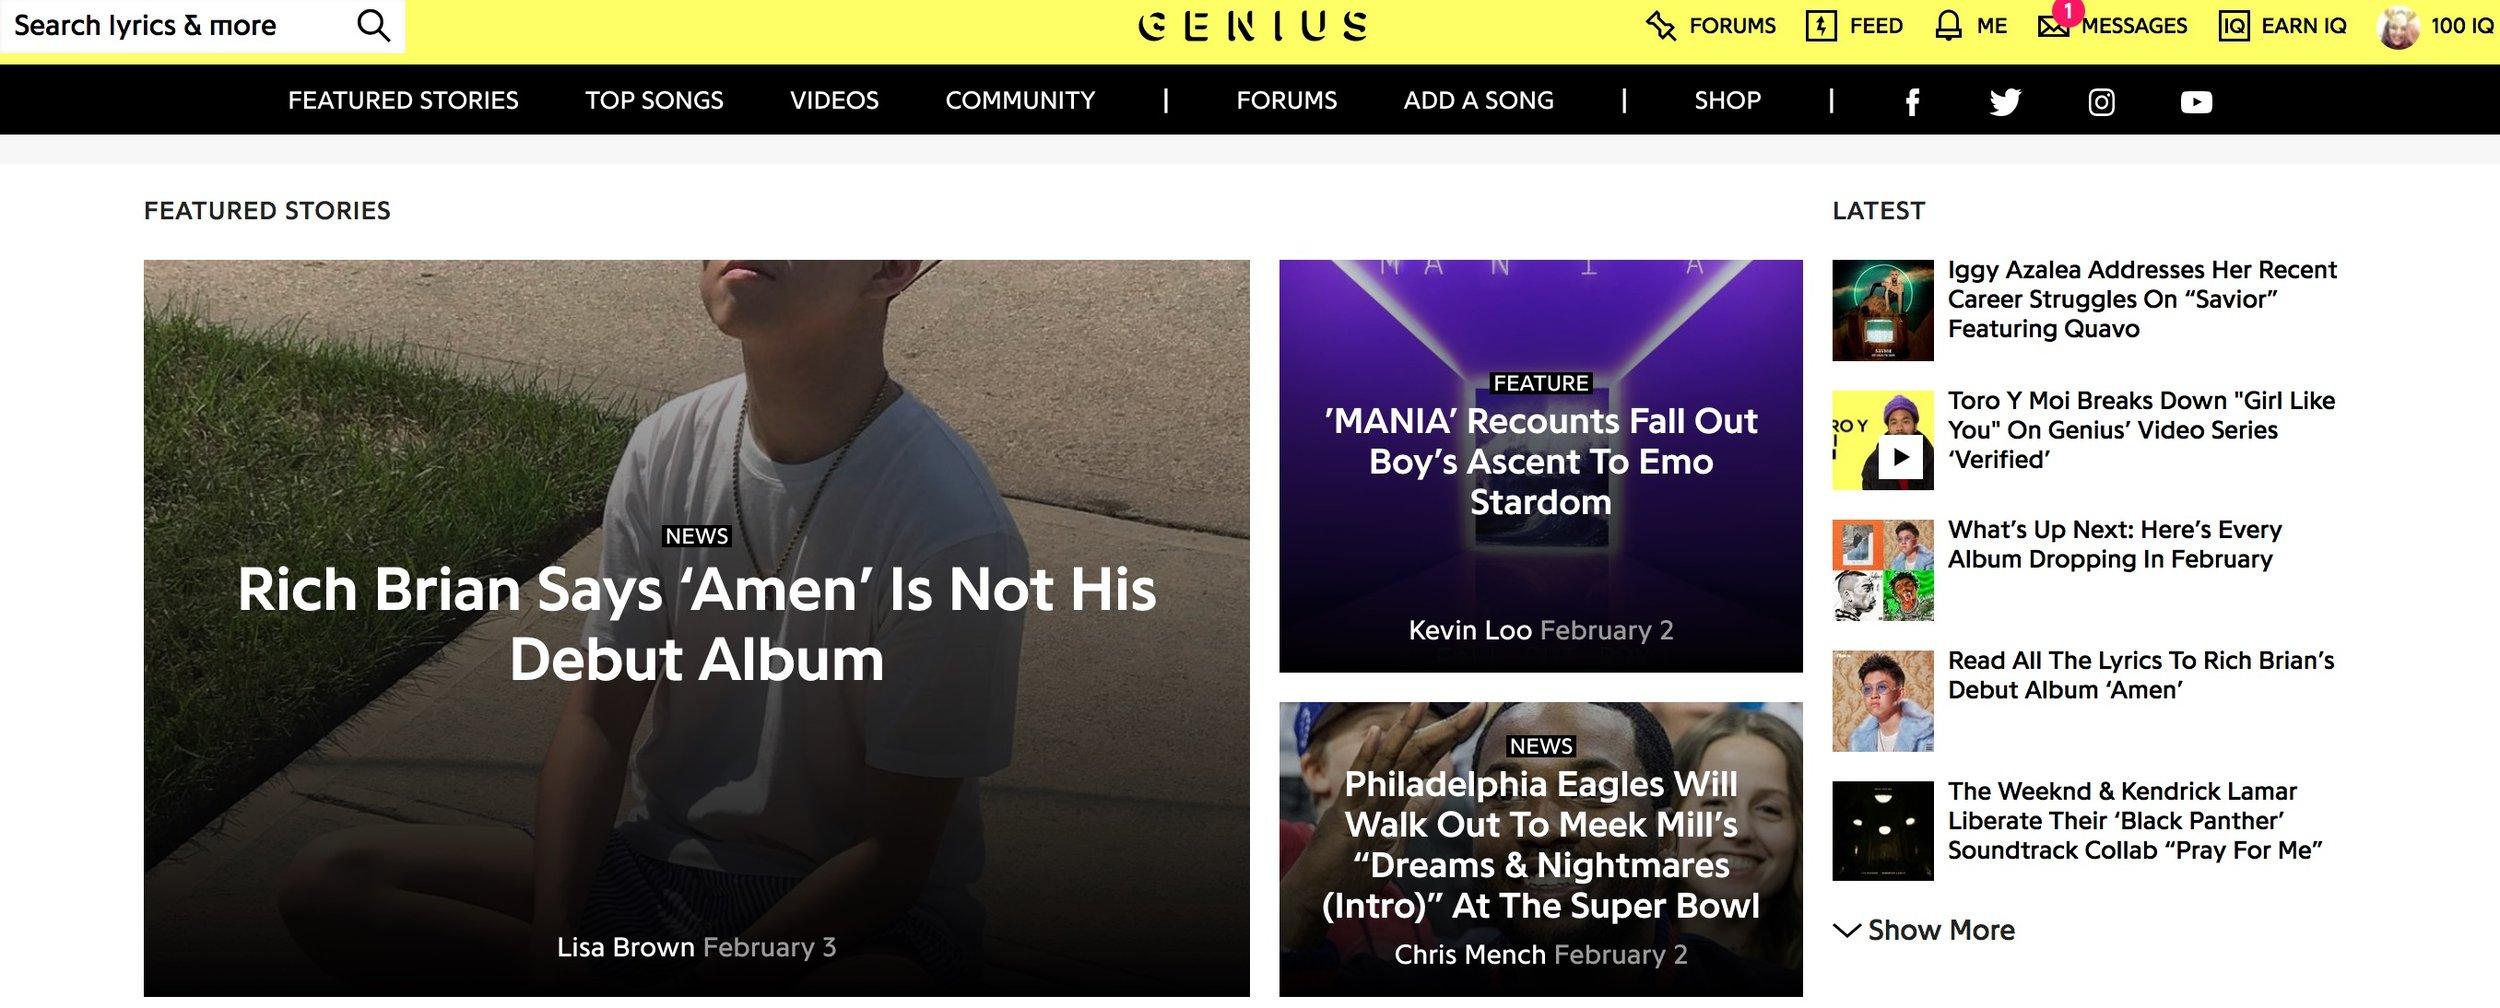 Genius___Song_Lyrics___Knowledge.jpg